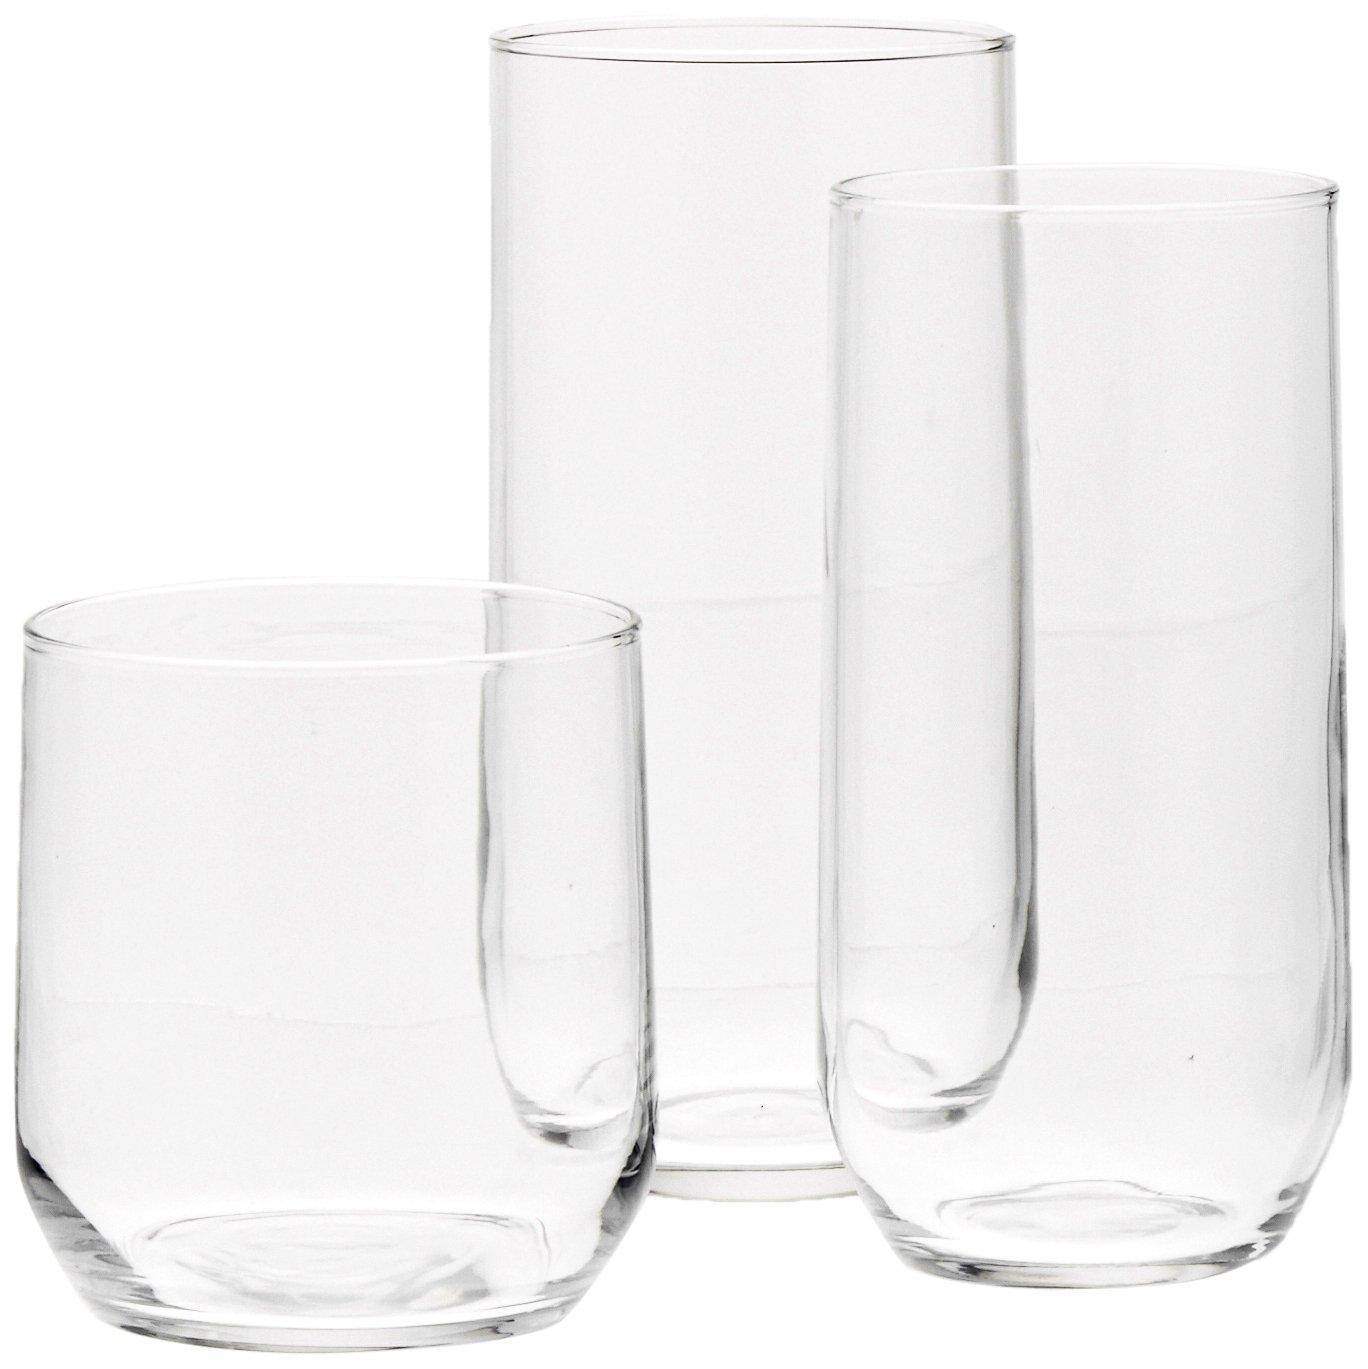 AmazonBasics 18-Piece Glassware Set by AmazonBasics